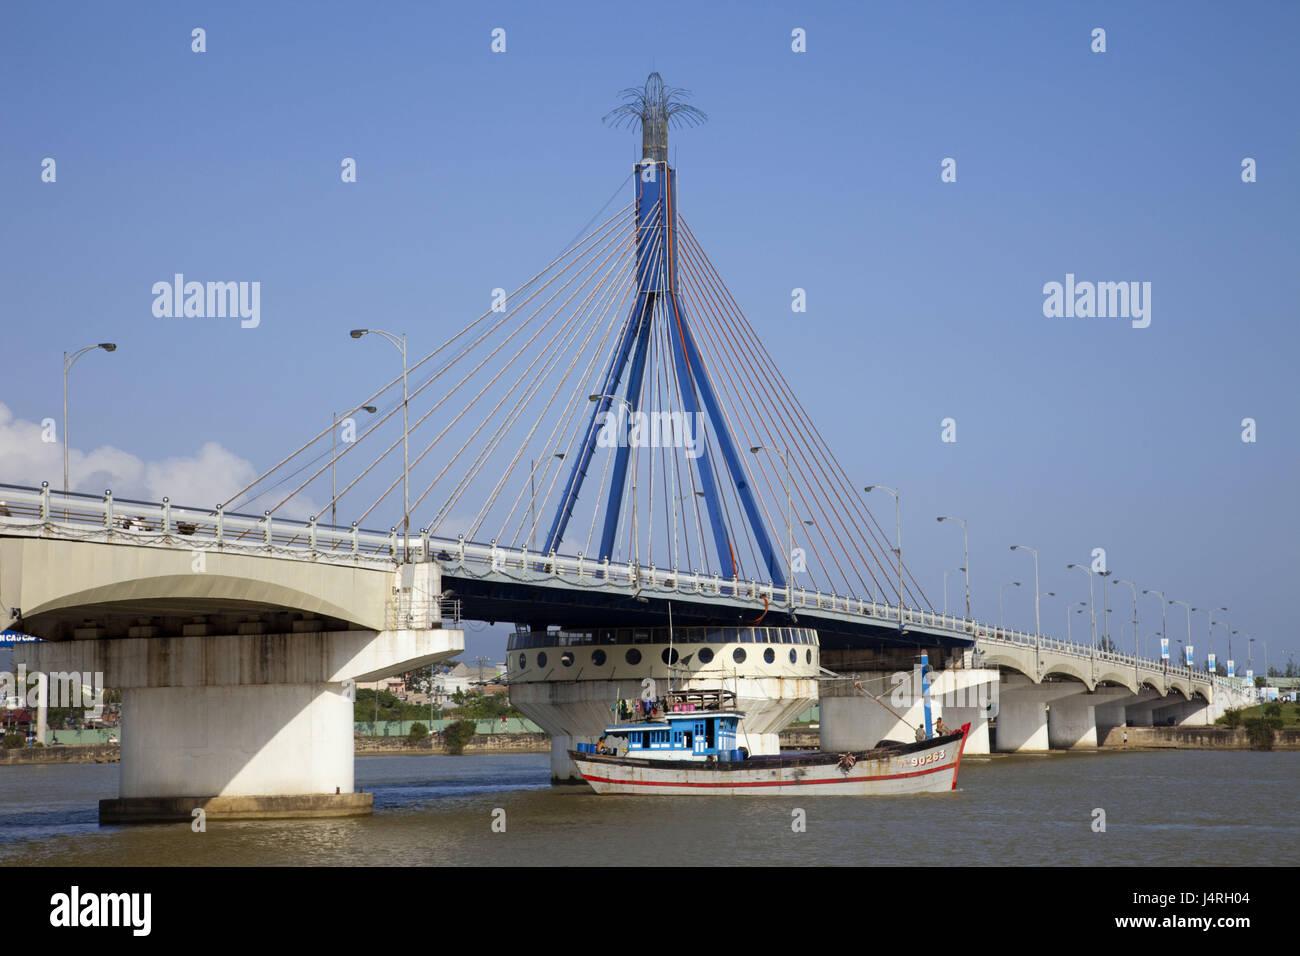 Vietnam, Danang, song Han Brücke and Han Fluss, ship, - Stock Image